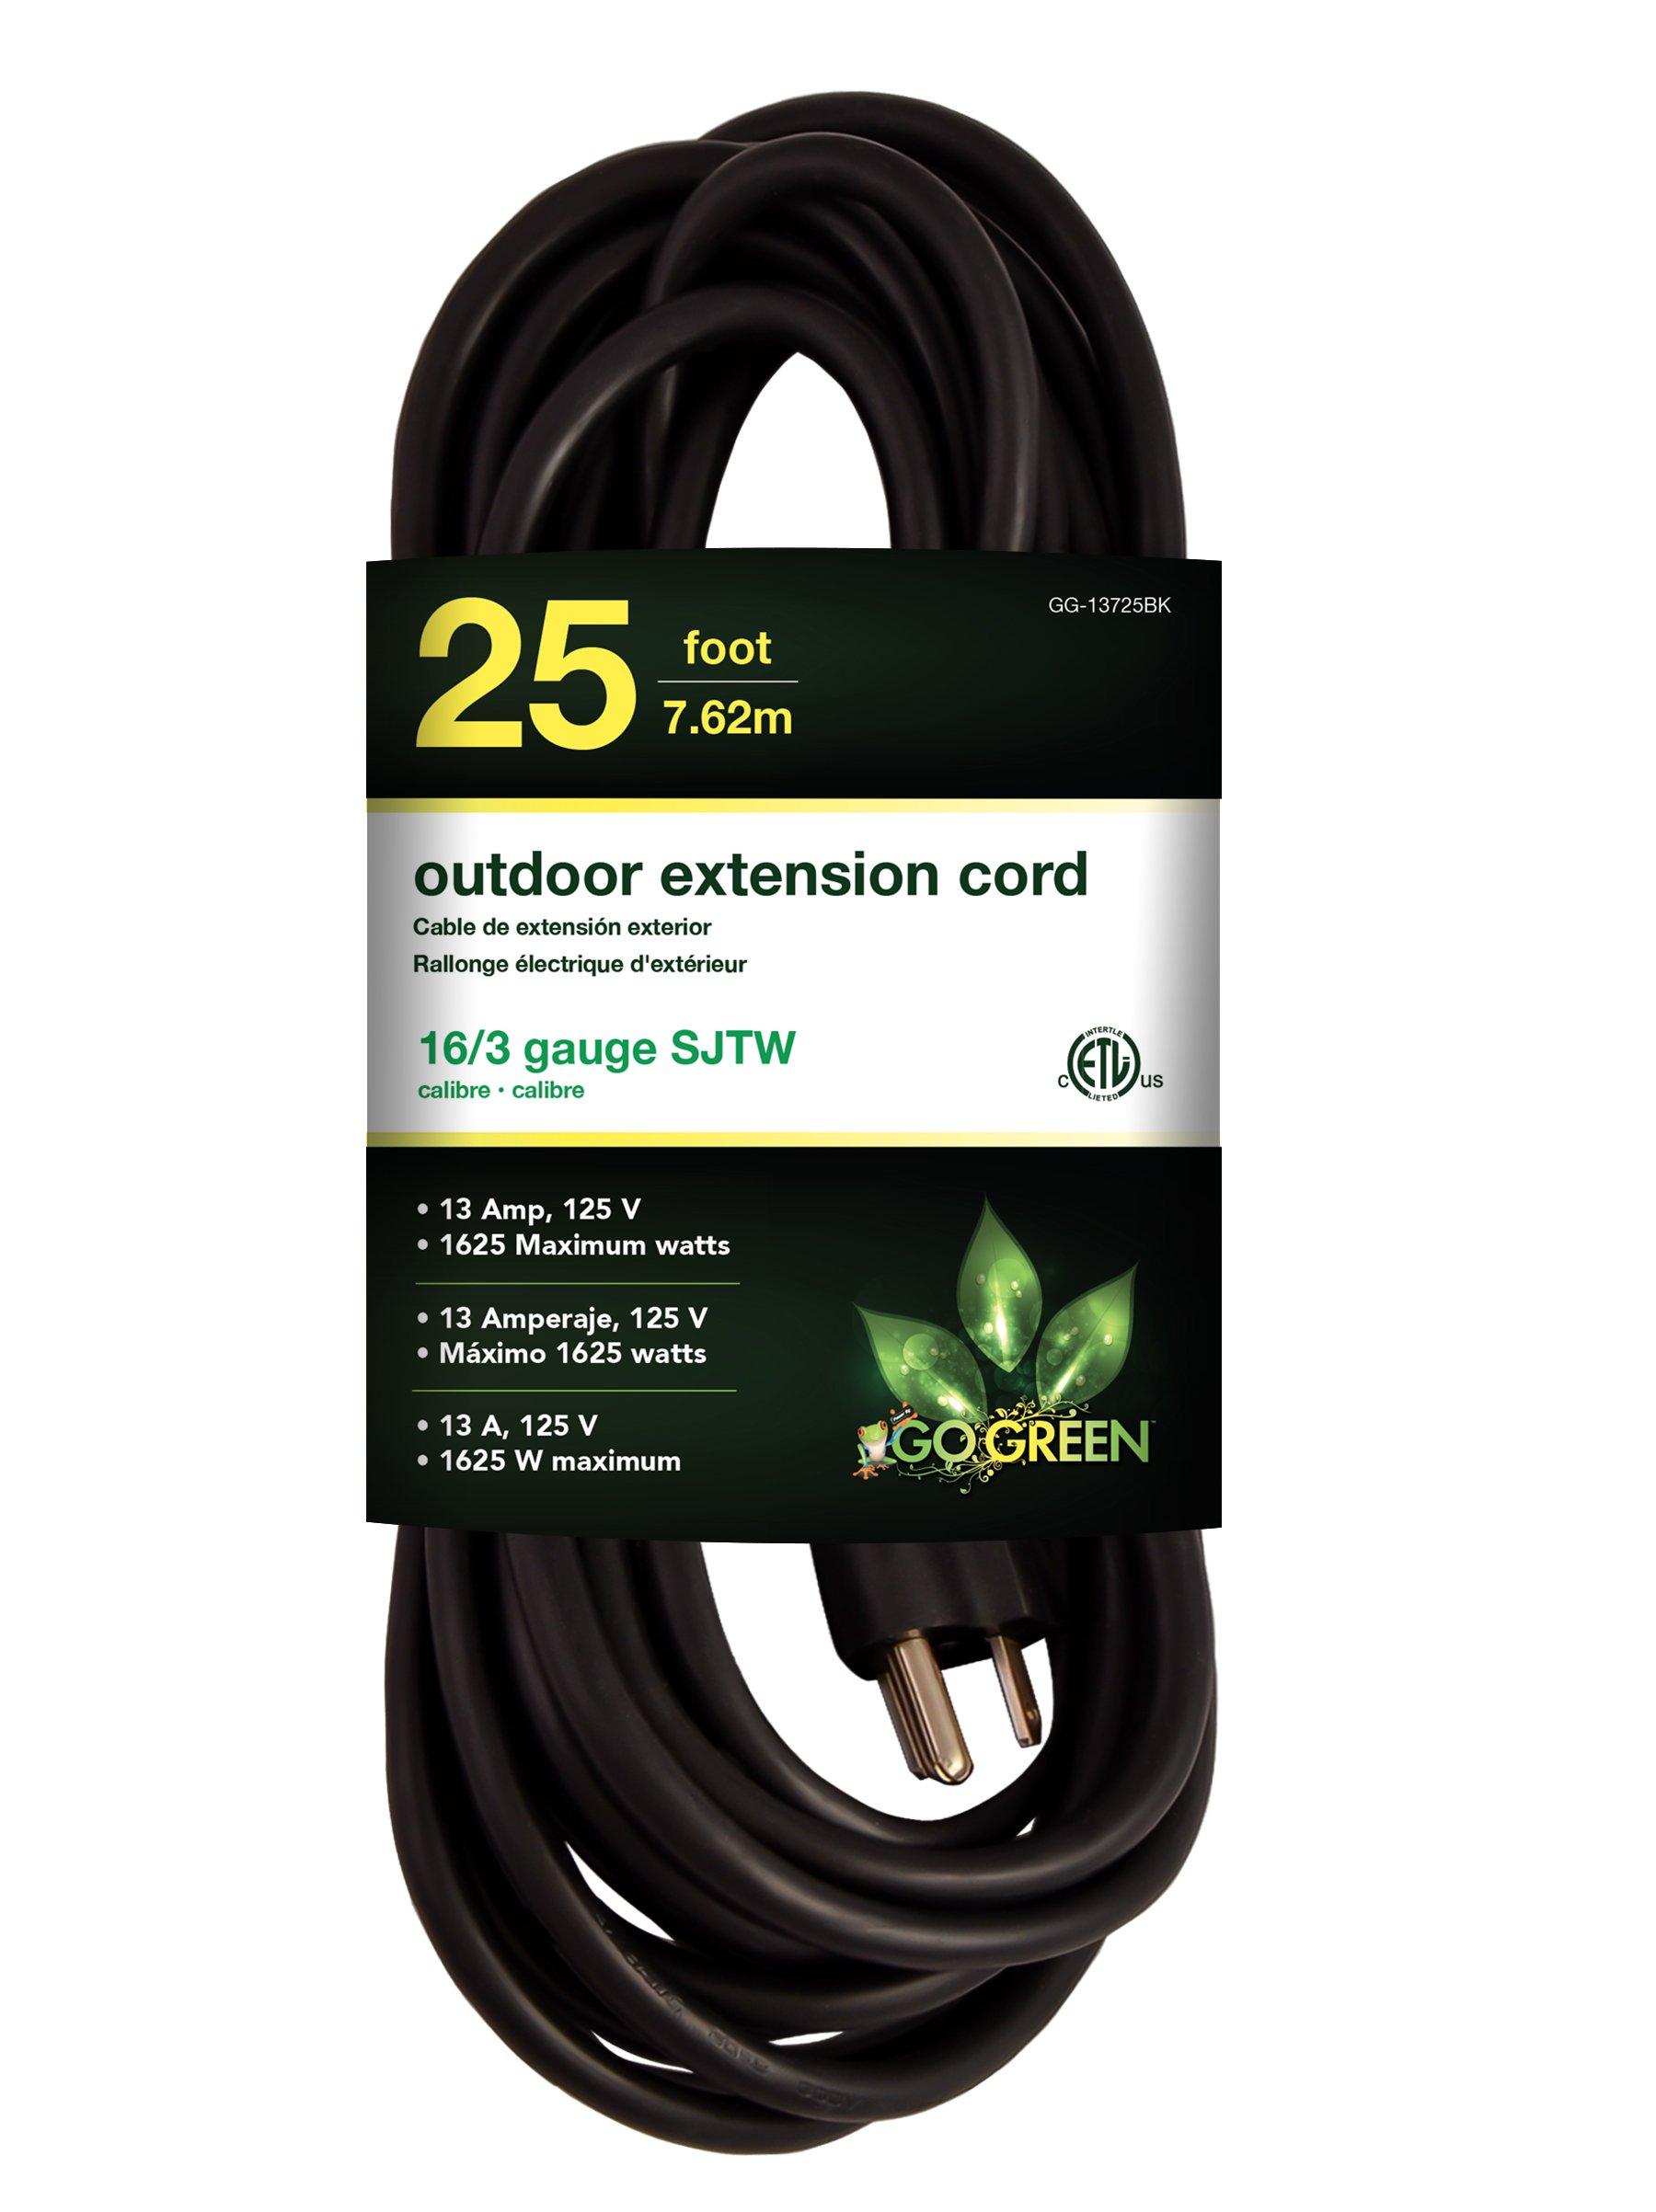 Go Green Power GG-13725BK Go Green Power 16/3 Heavy Duty Extension Cord, 25', Black